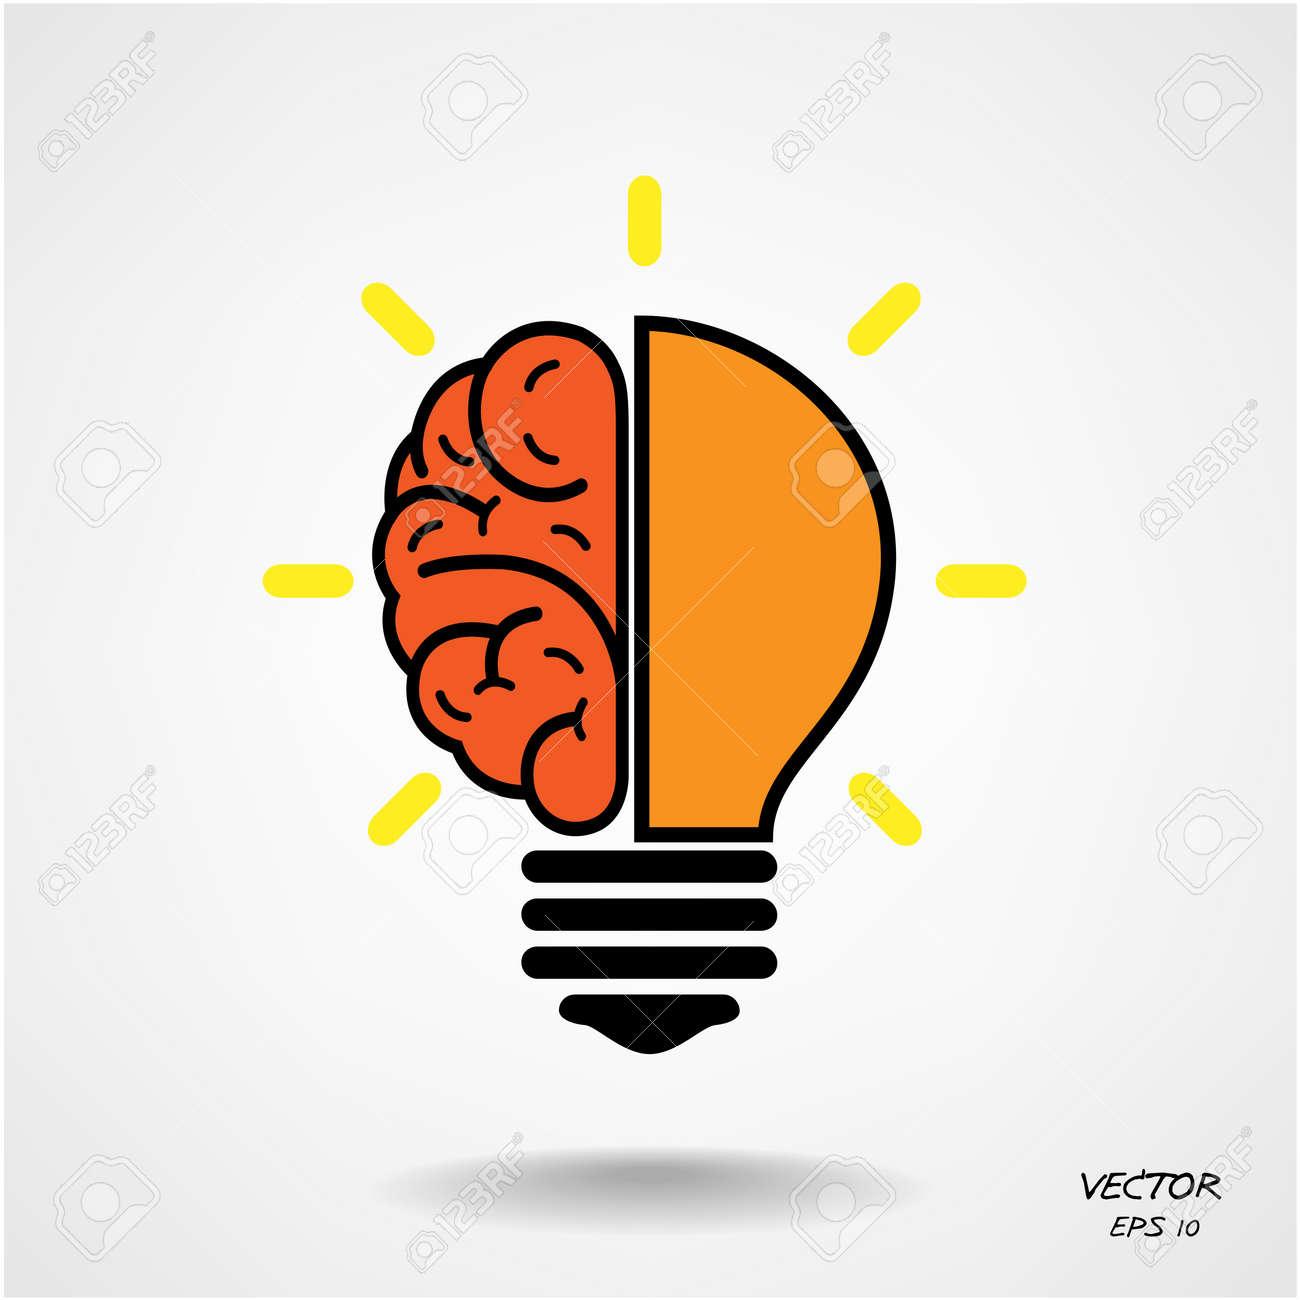 Creative Brain Idea Concept Background Design Stock Vector   25249091